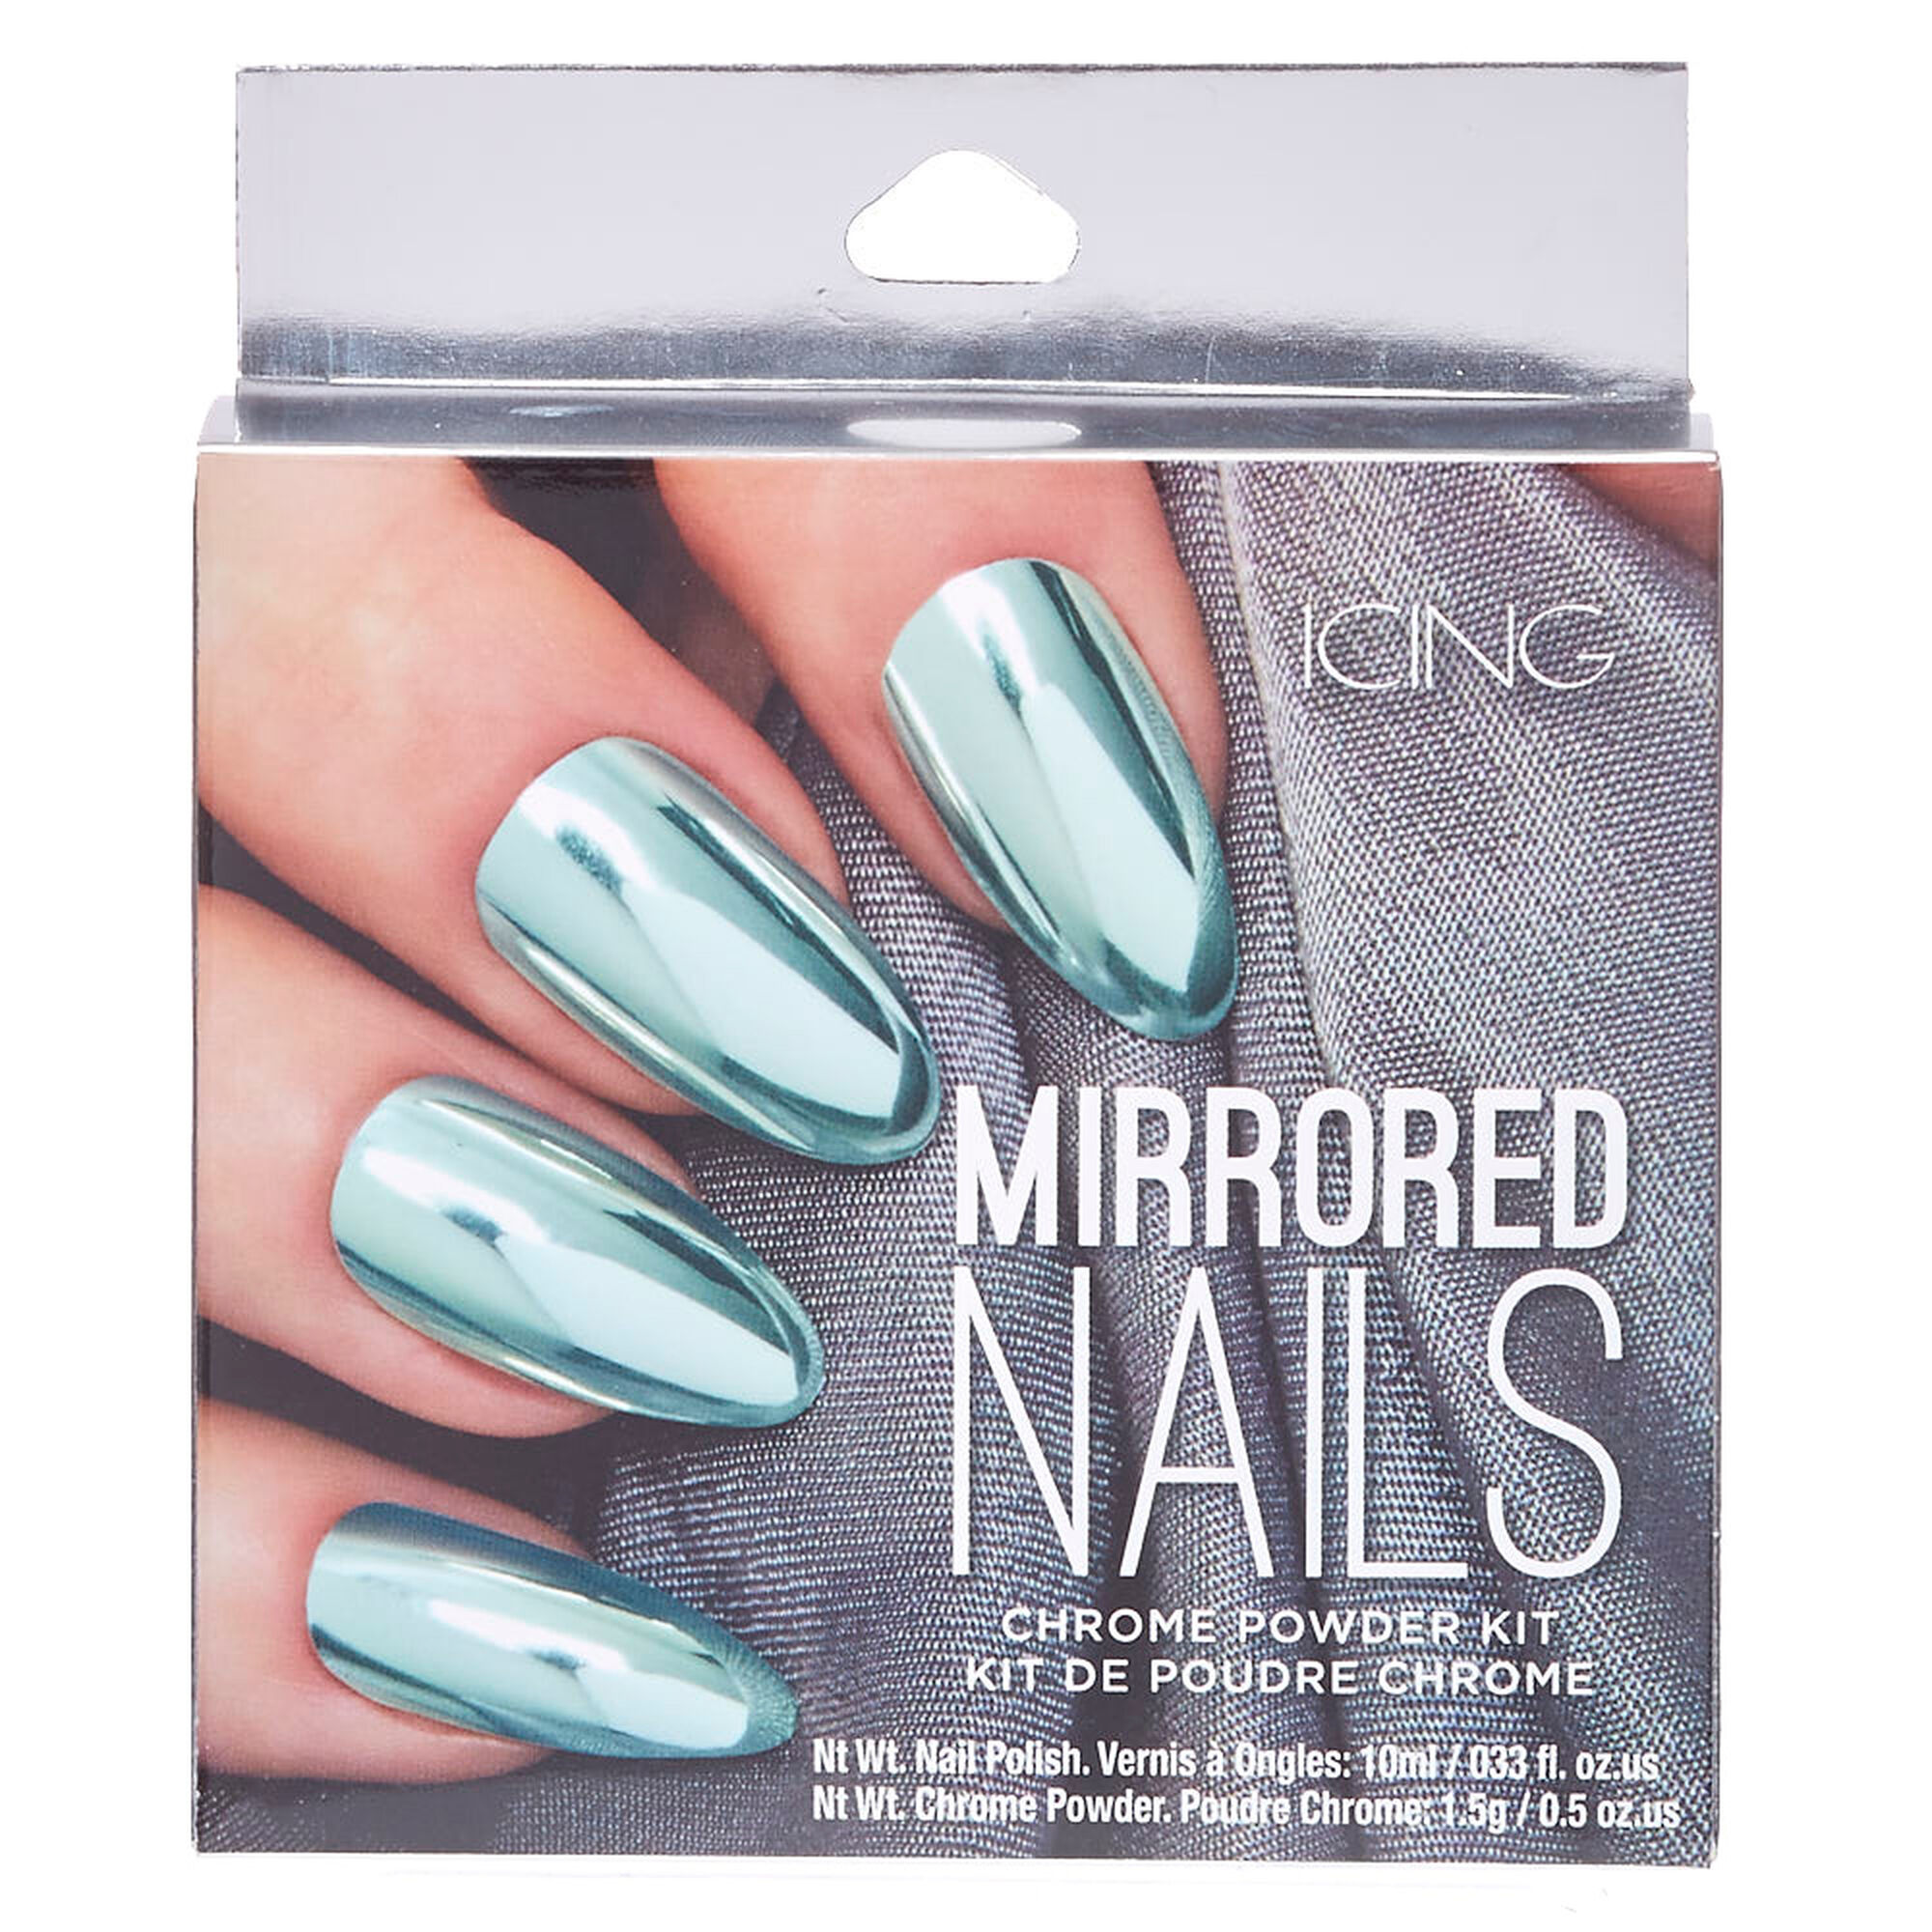 Mint Chrome Powder Nails Kit | Icing US